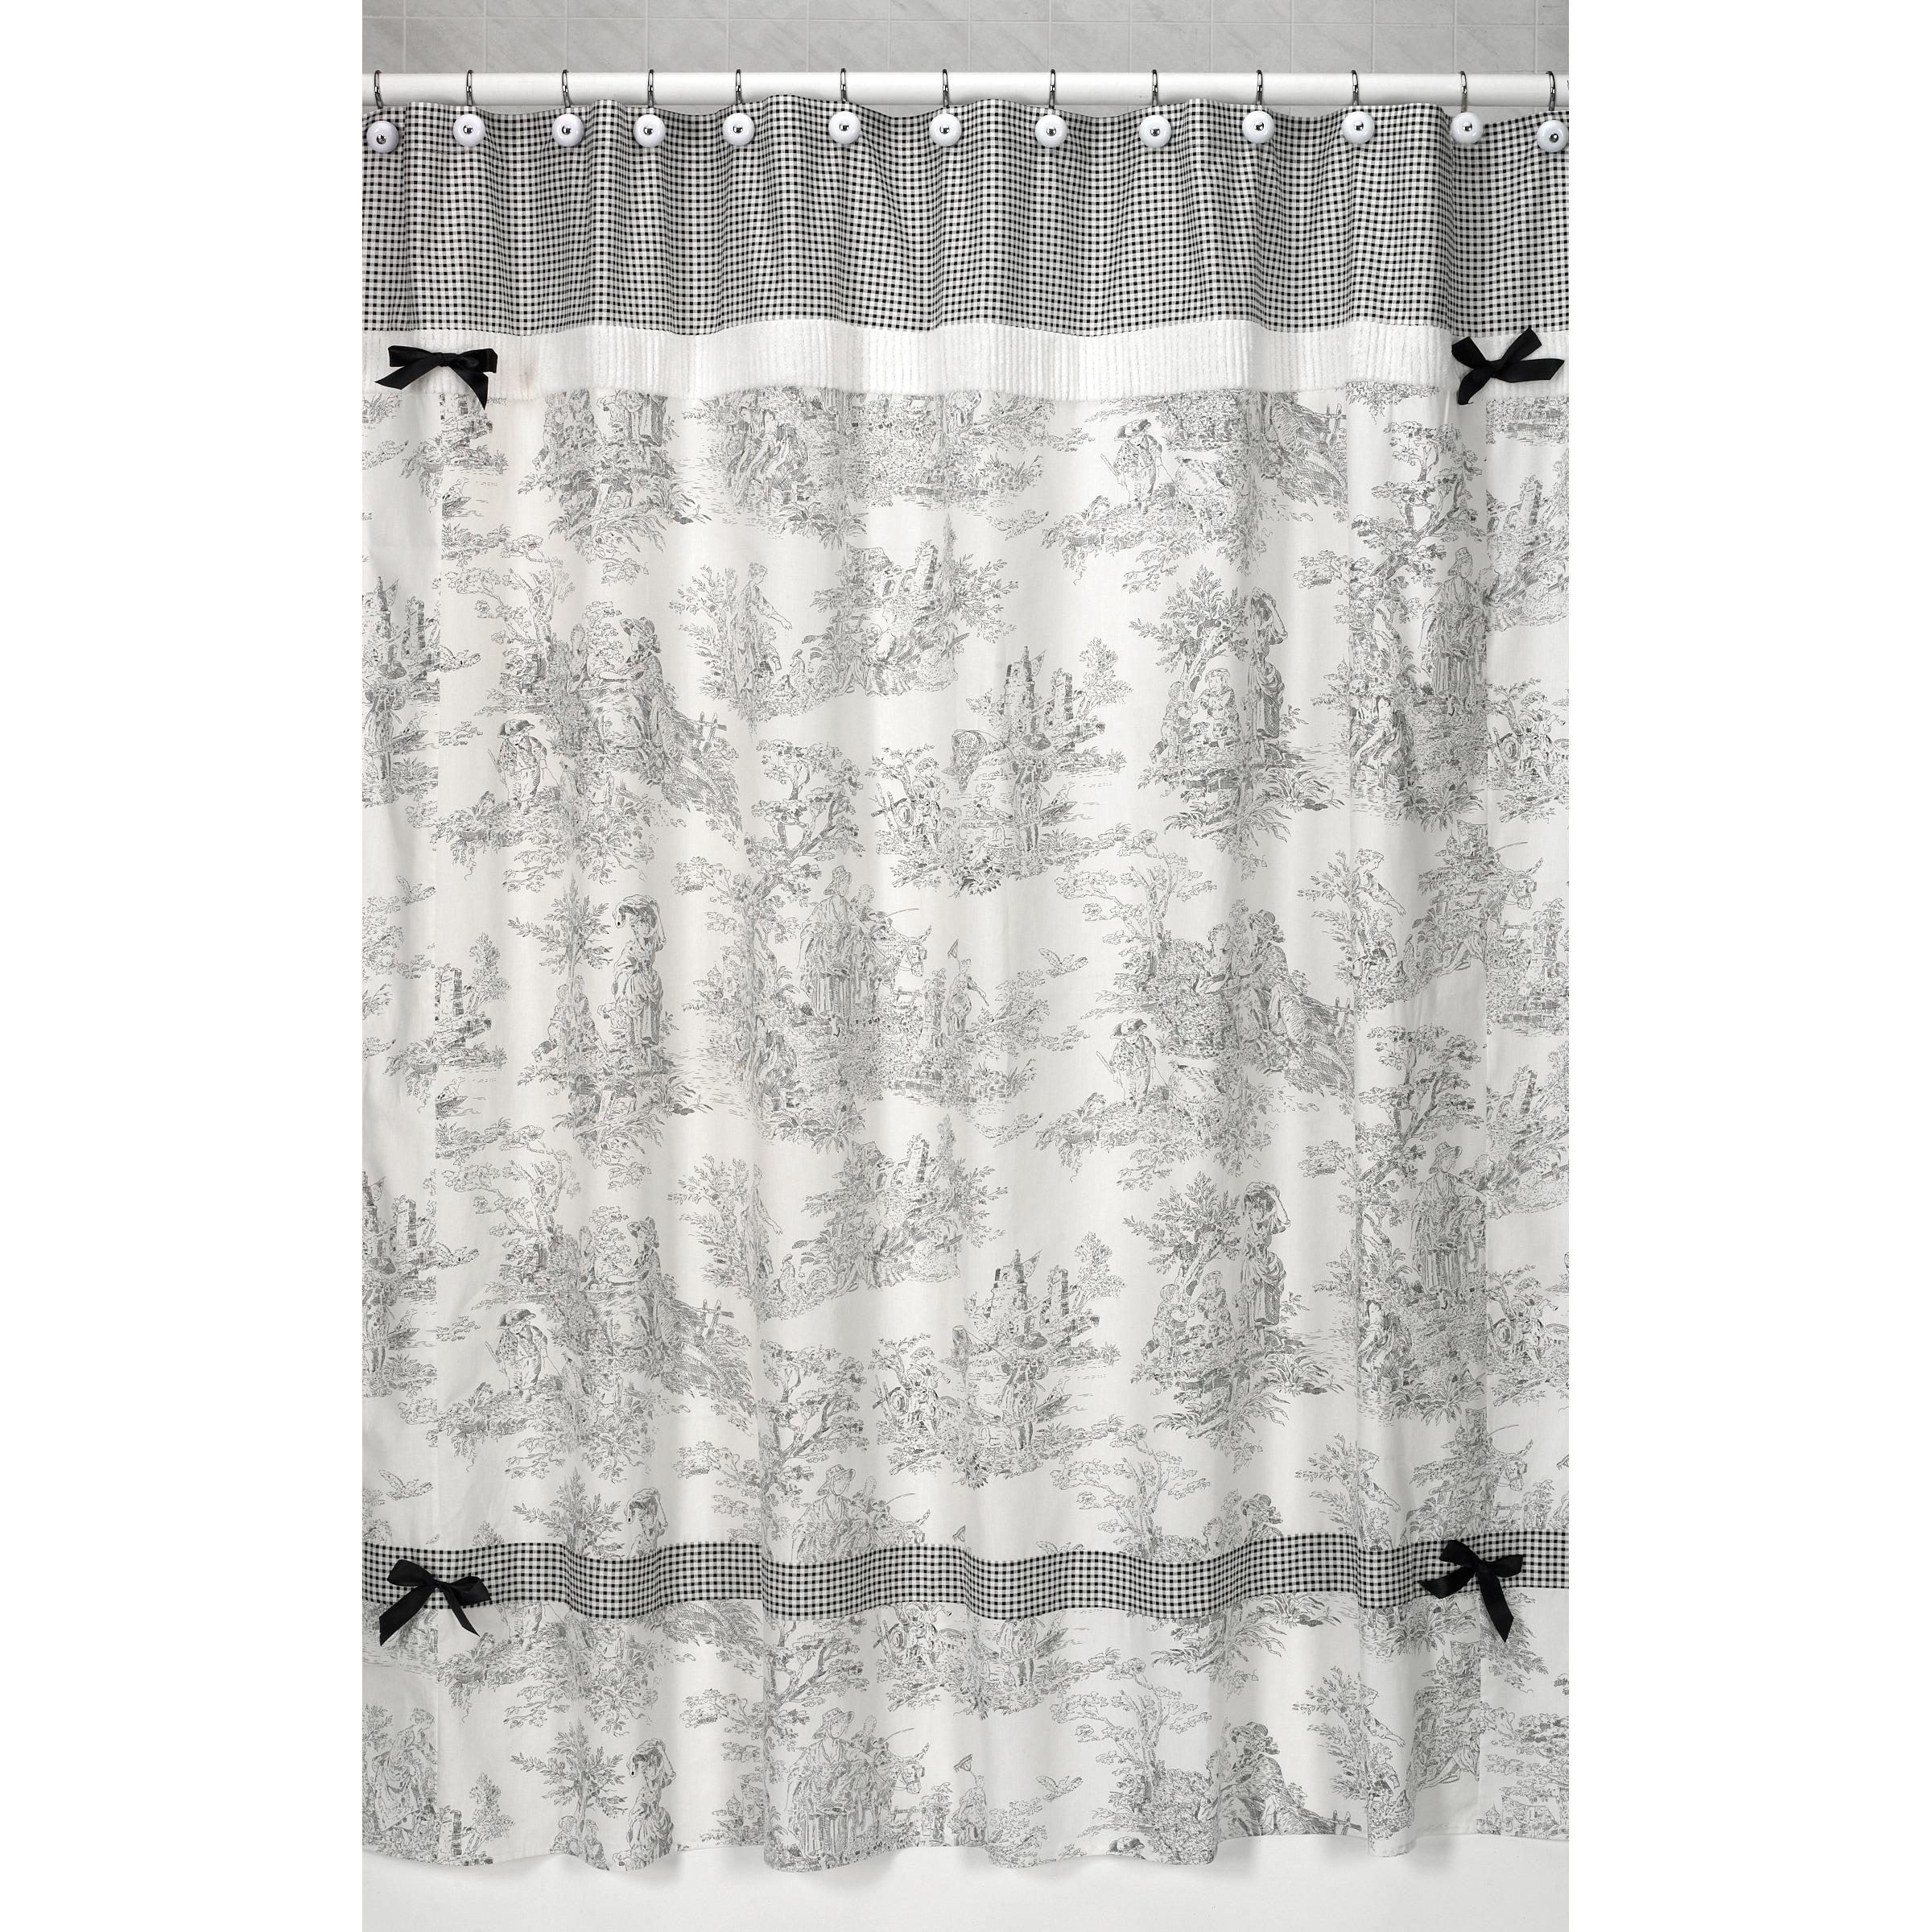 Shop Sweet Jojo Designs Black French Toile Shower Curtain - Free ...